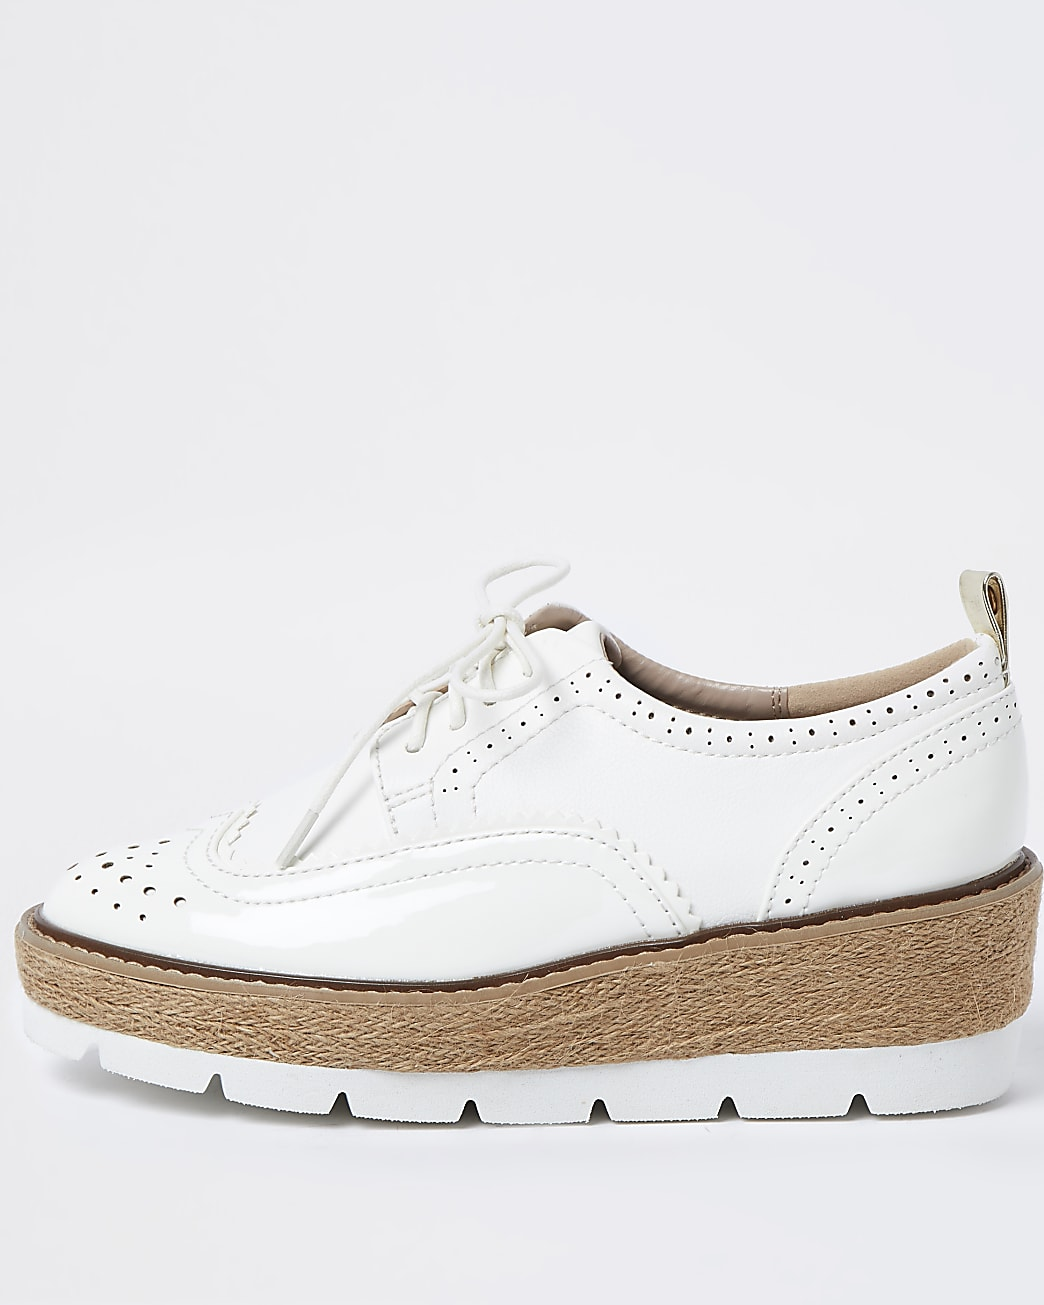 White brogue wedge platform shoes